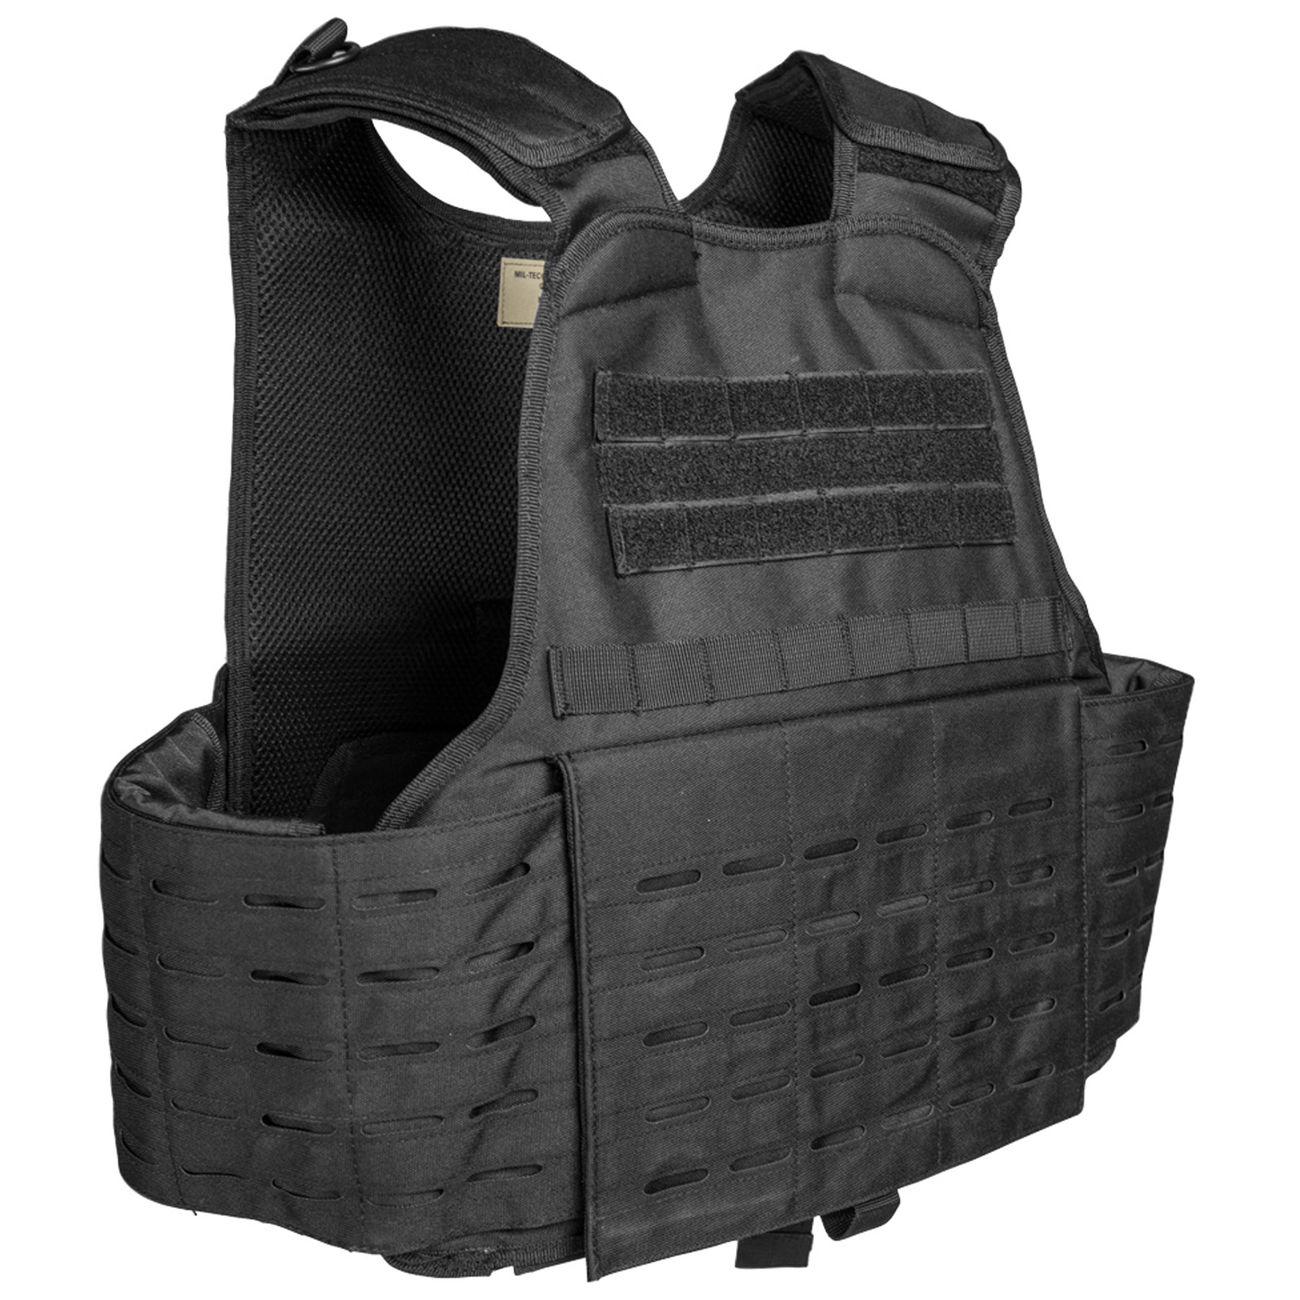 mil tec einsatzweste carrier laser cut schwarz g nstig kaufen kotte zeller. Black Bedroom Furniture Sets. Home Design Ideas